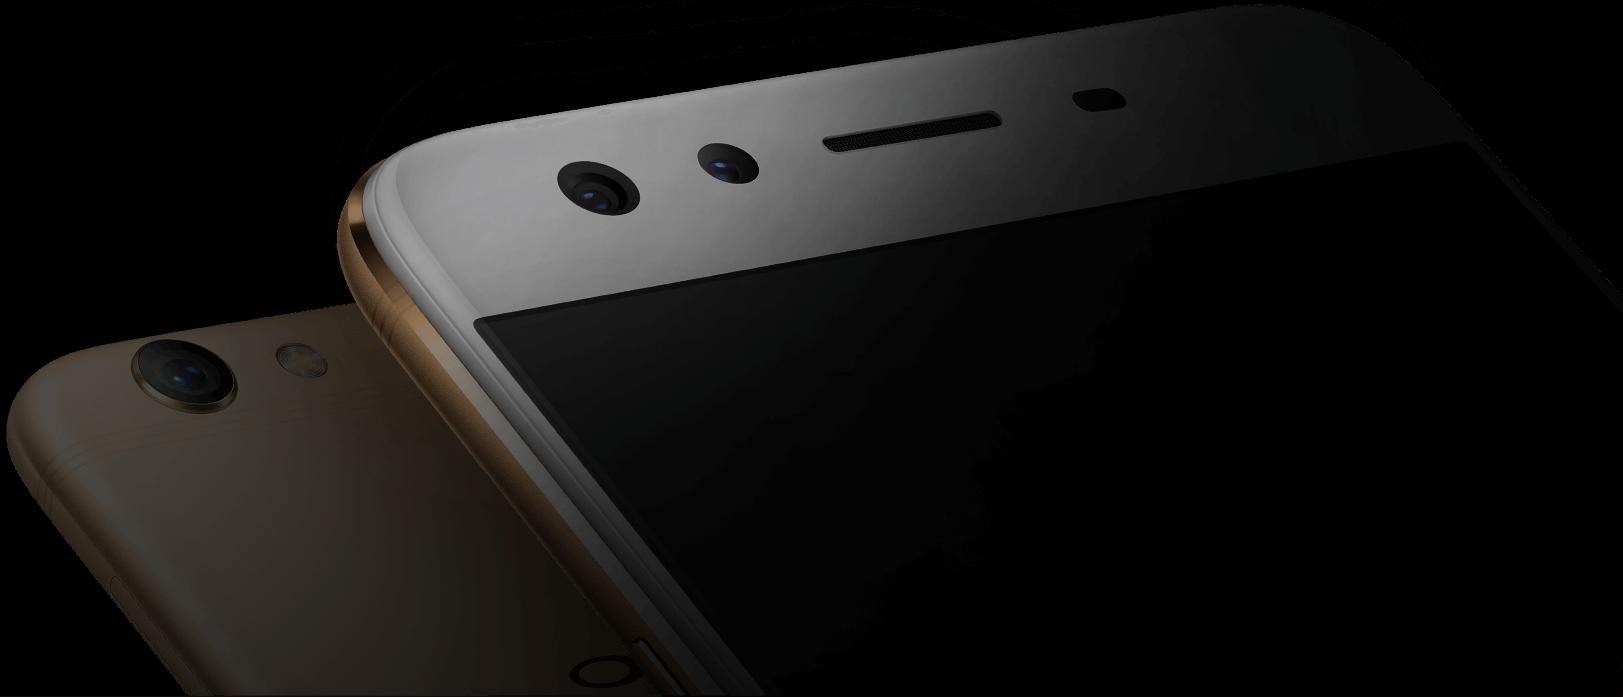 Oppo F3 Plus tín đồ selfie